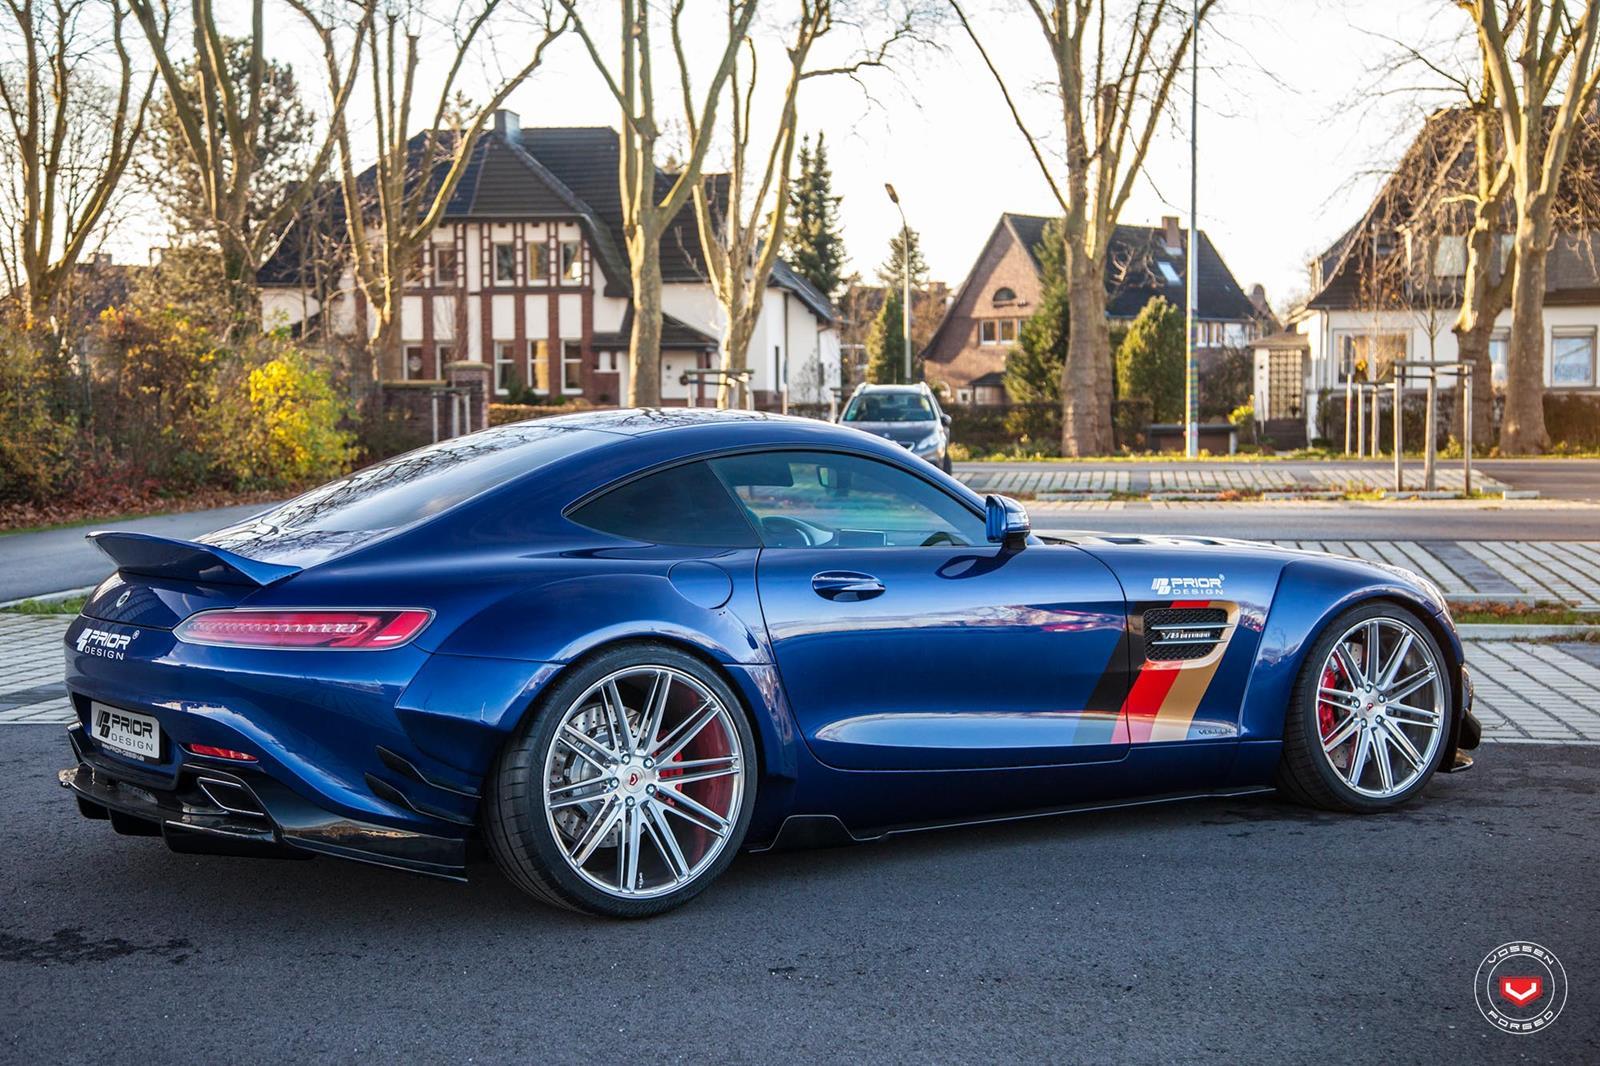 Mercedes Gts Prior Design On Vossen Forged Vps 307